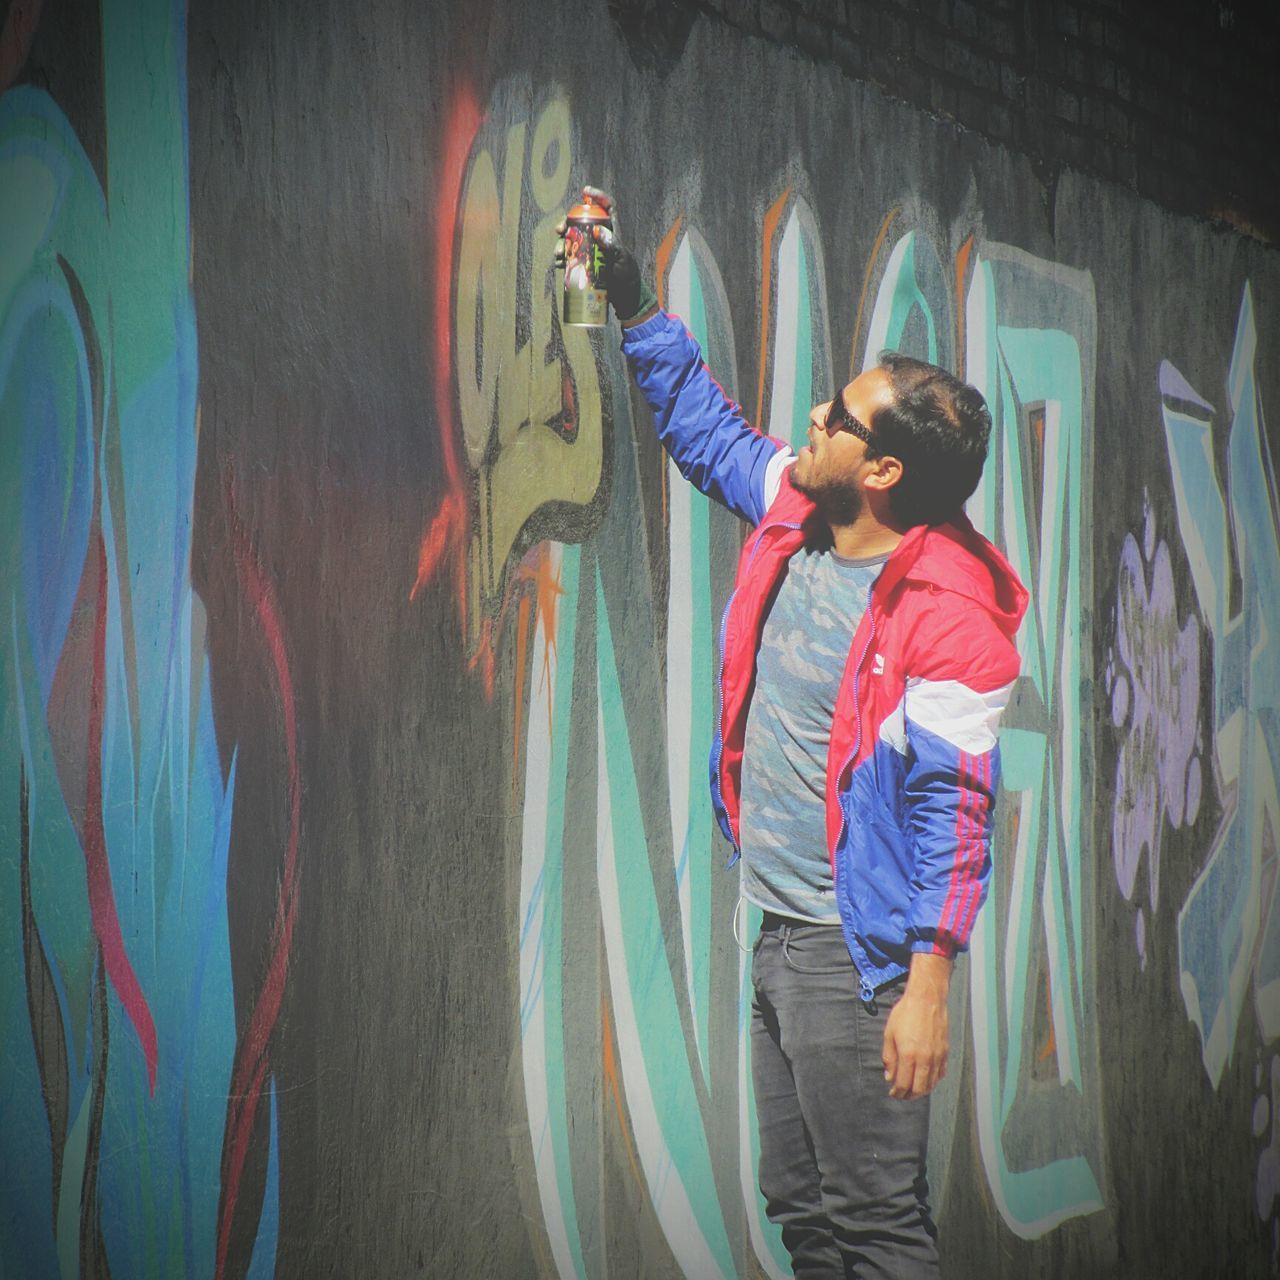 Master_shots Drawing. Colorful Graffiti Street Art, Drawing, Creativity Aerosol Symbol Getty Images Colors